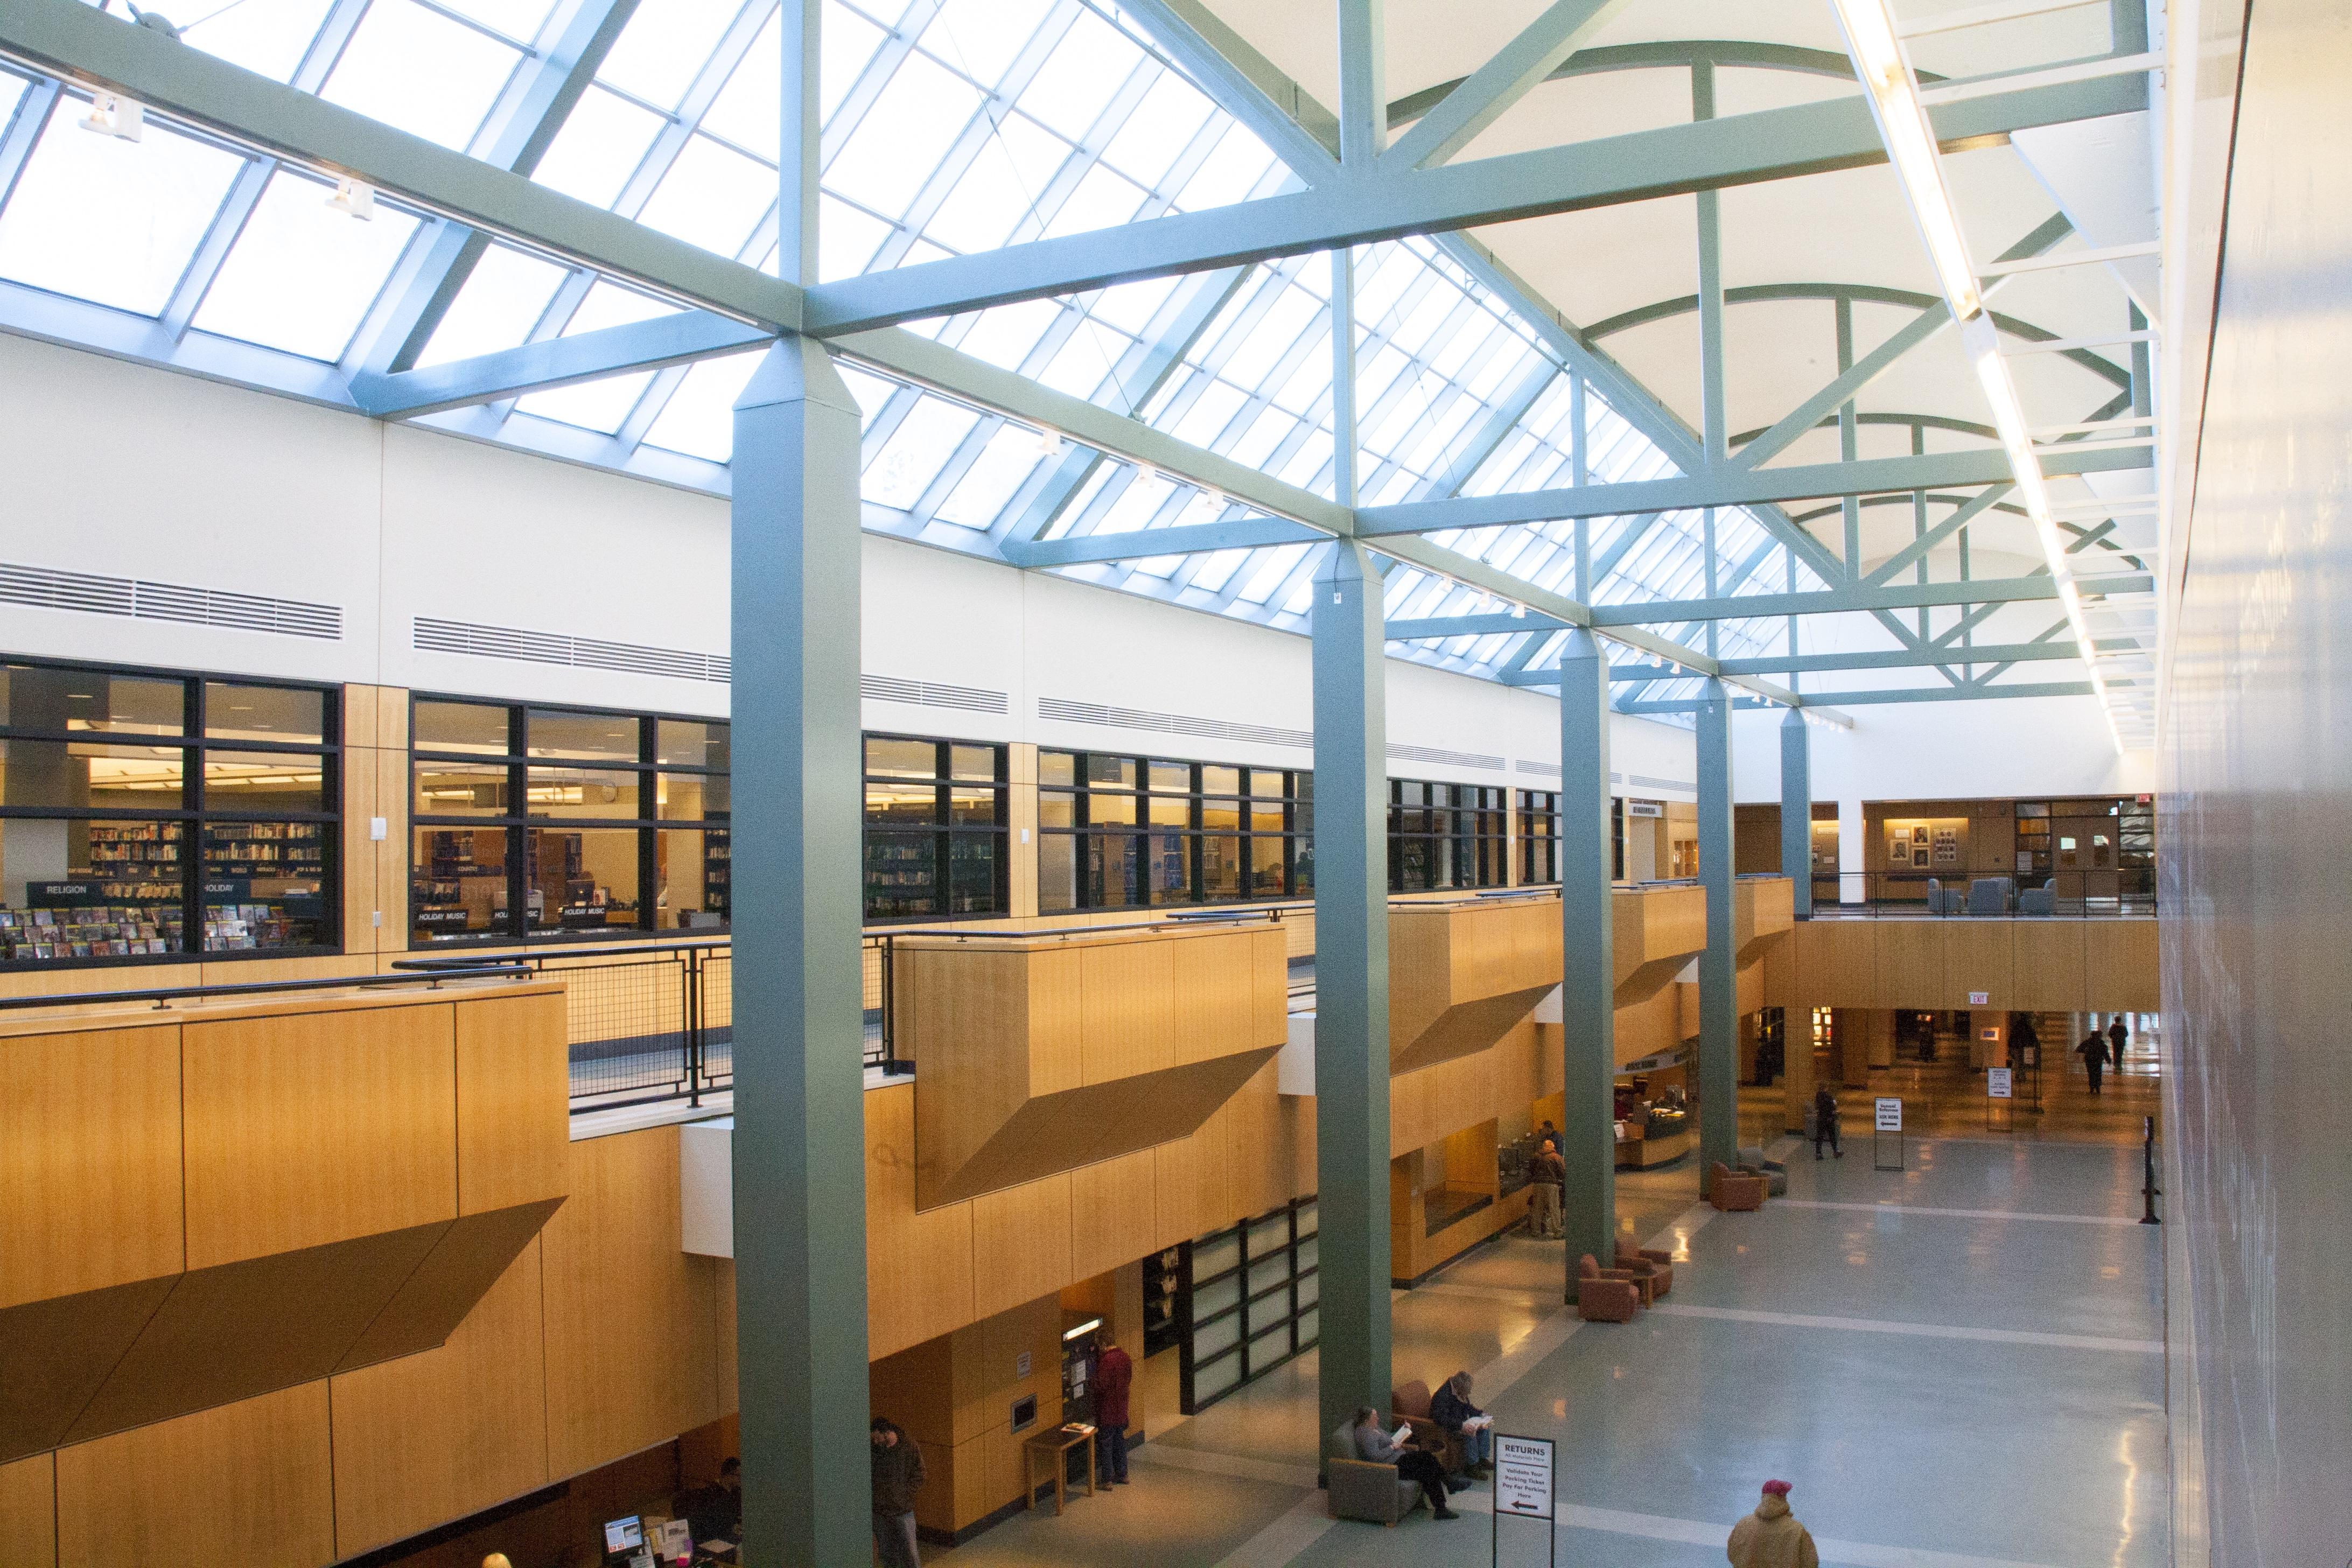 Balcony Concert Construction Railing Curve High Atrium Frame Office Black Room Modern Interior Design Airport Terminal Library Passage